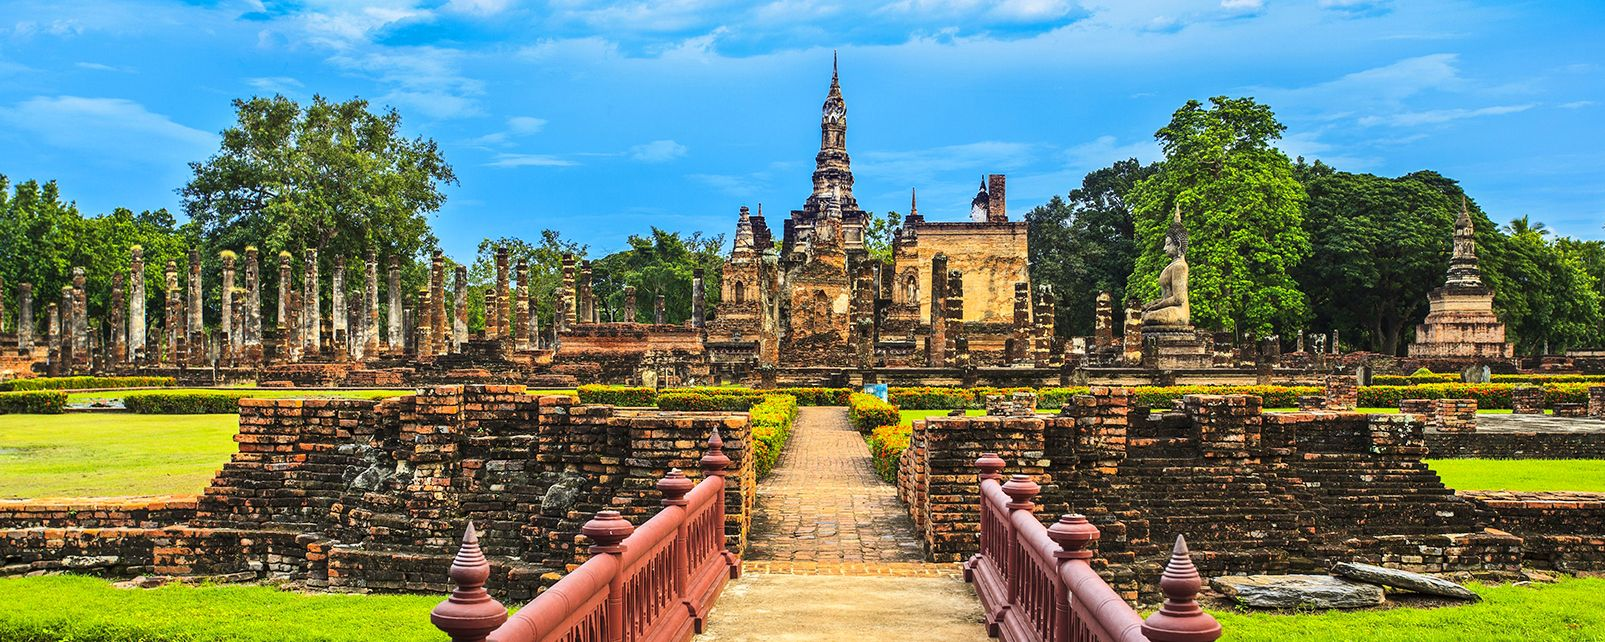 Sukhothai, Thailand, Sukhotai, Monuments, Sukhothai, Thailand